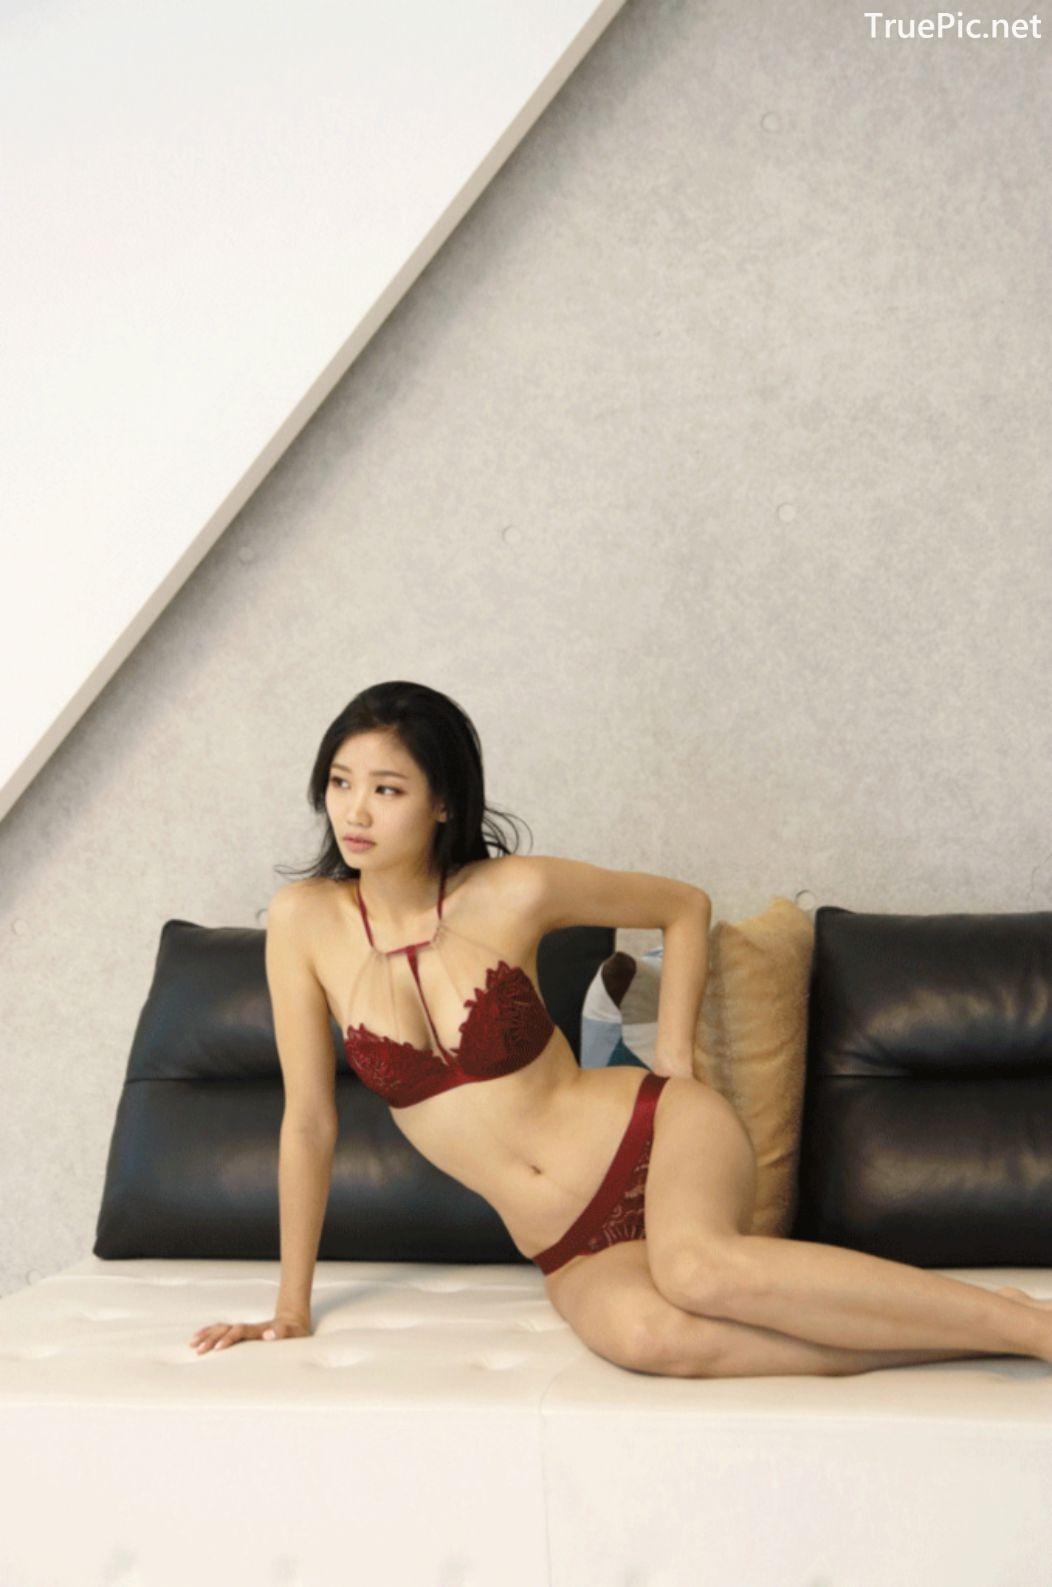 Image Korean Fashion Model - Lee Hee Eun - Baghdad Caffeine Burgundy Lingerie - TruePic.net - Picture-8